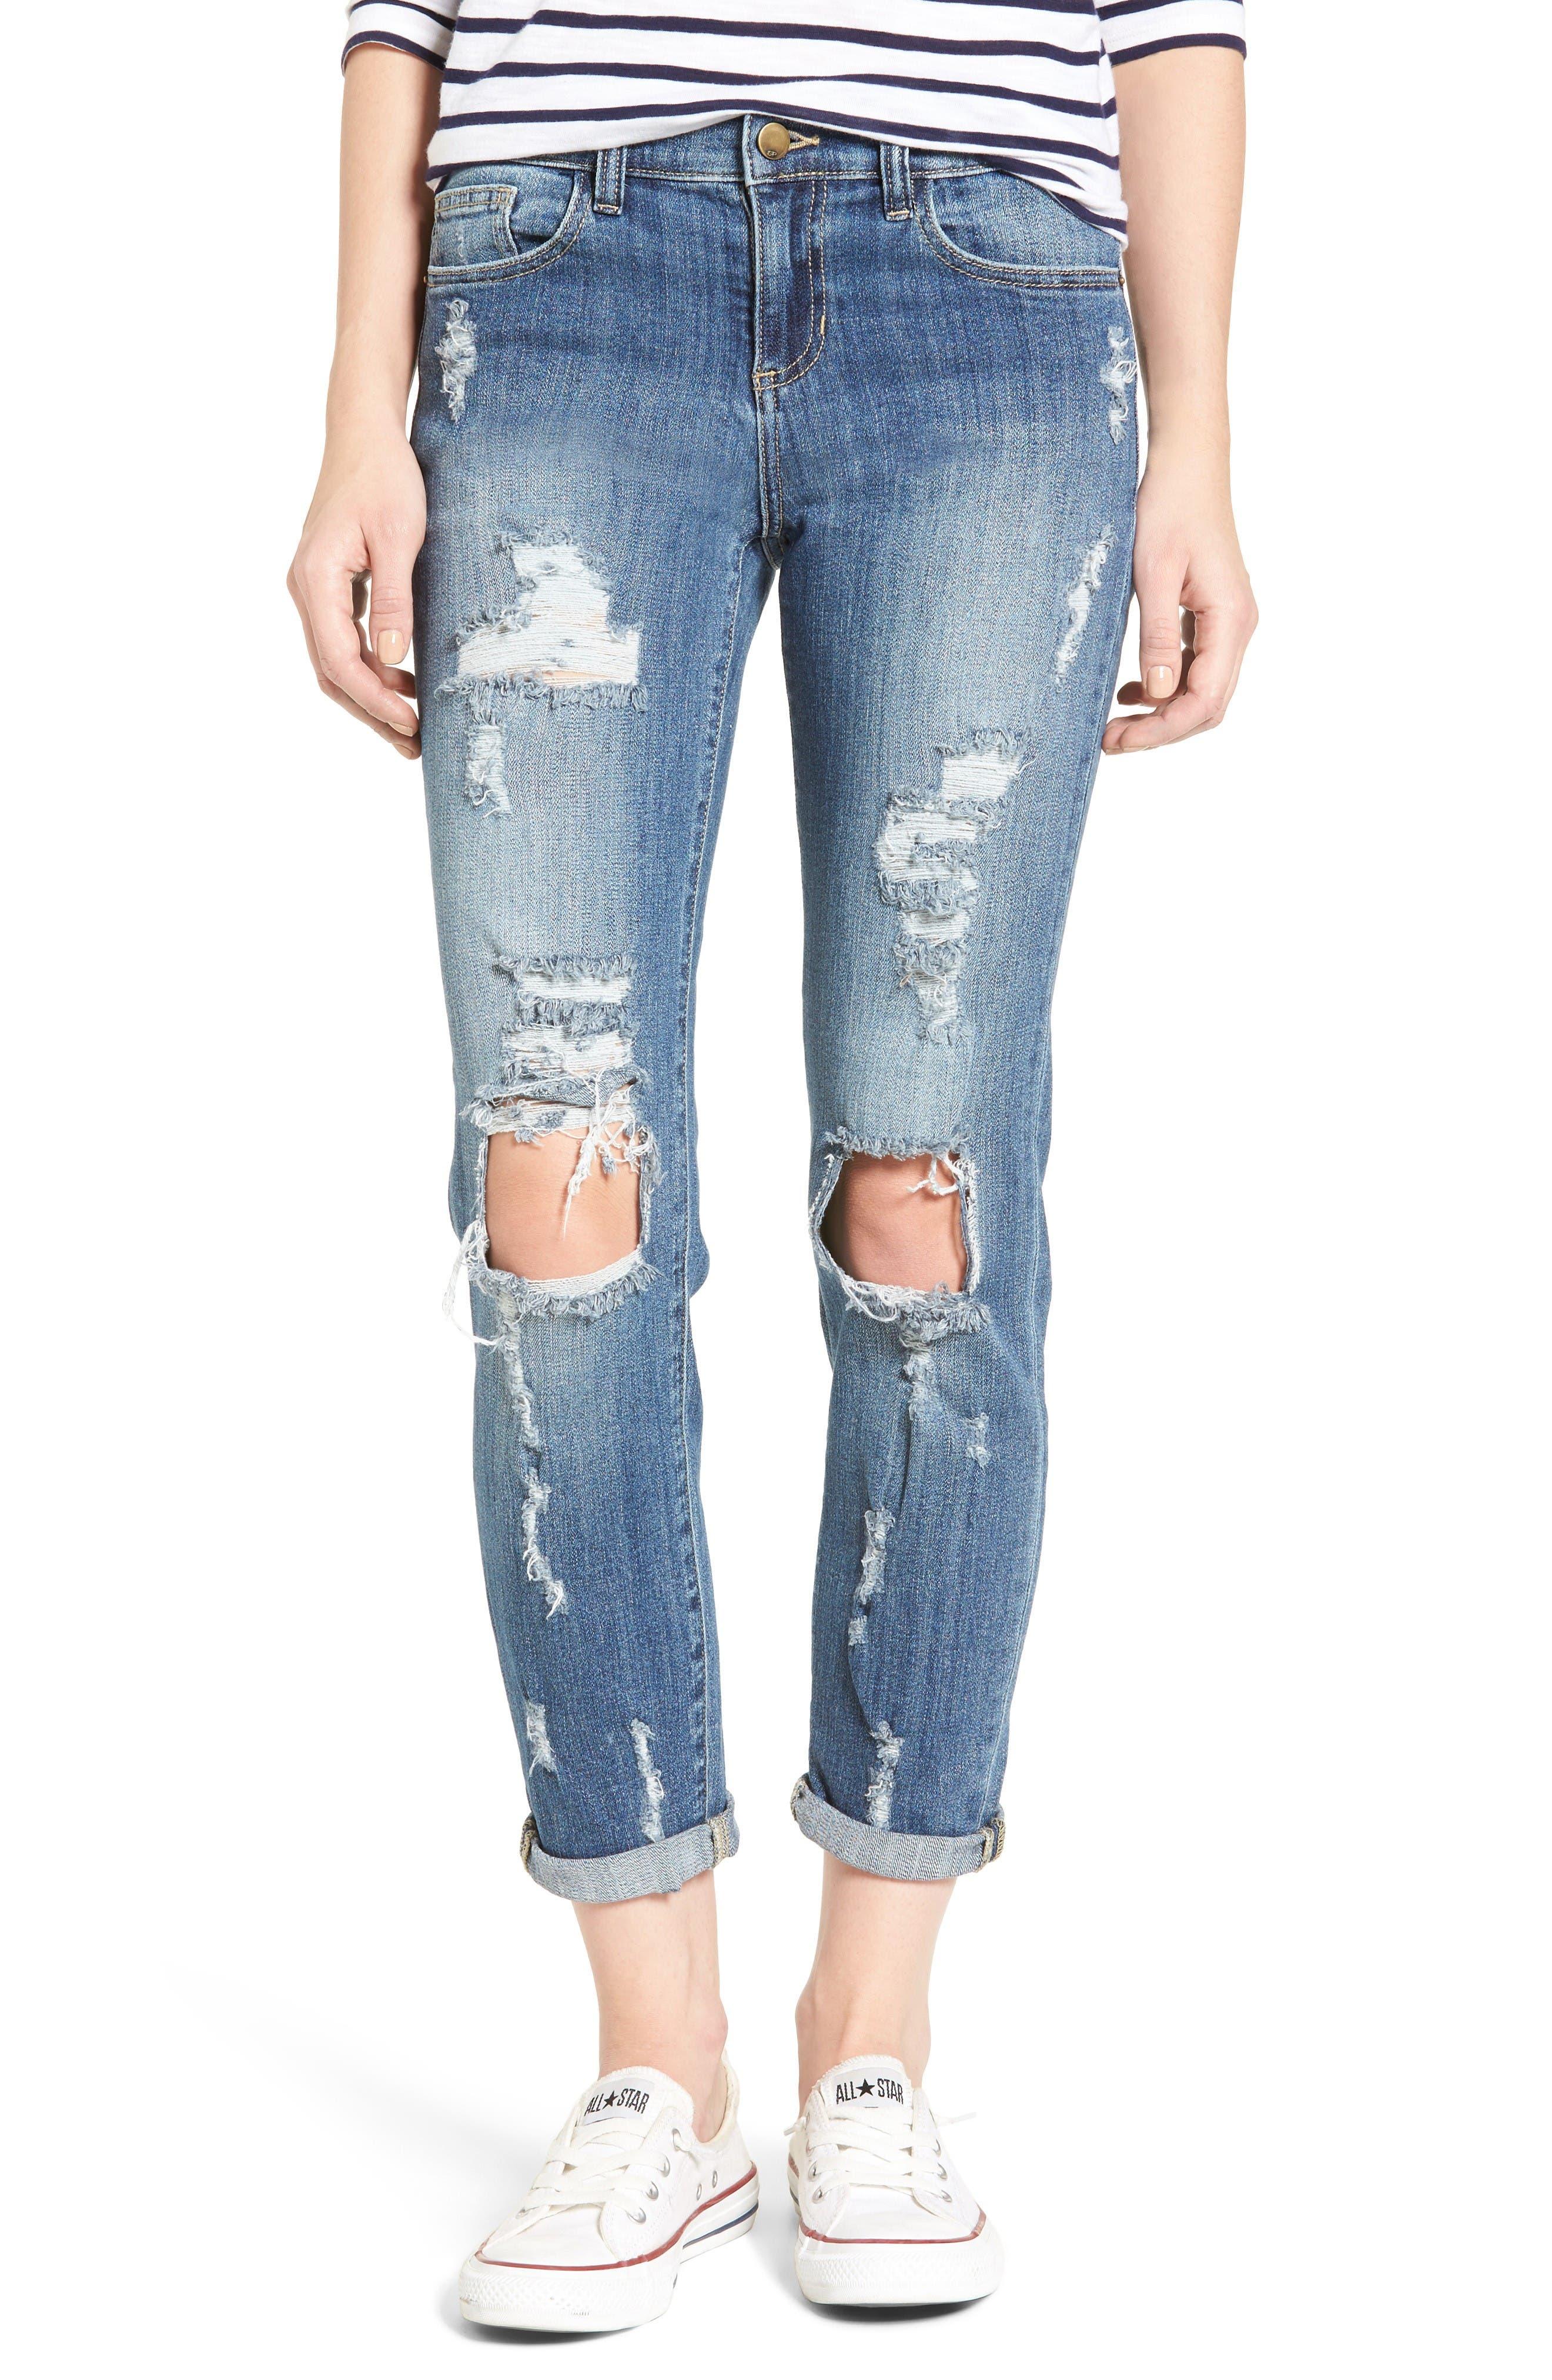 Alternate Image 1 Selected - SP Black Decon Destroyed Boyfriend Jeans